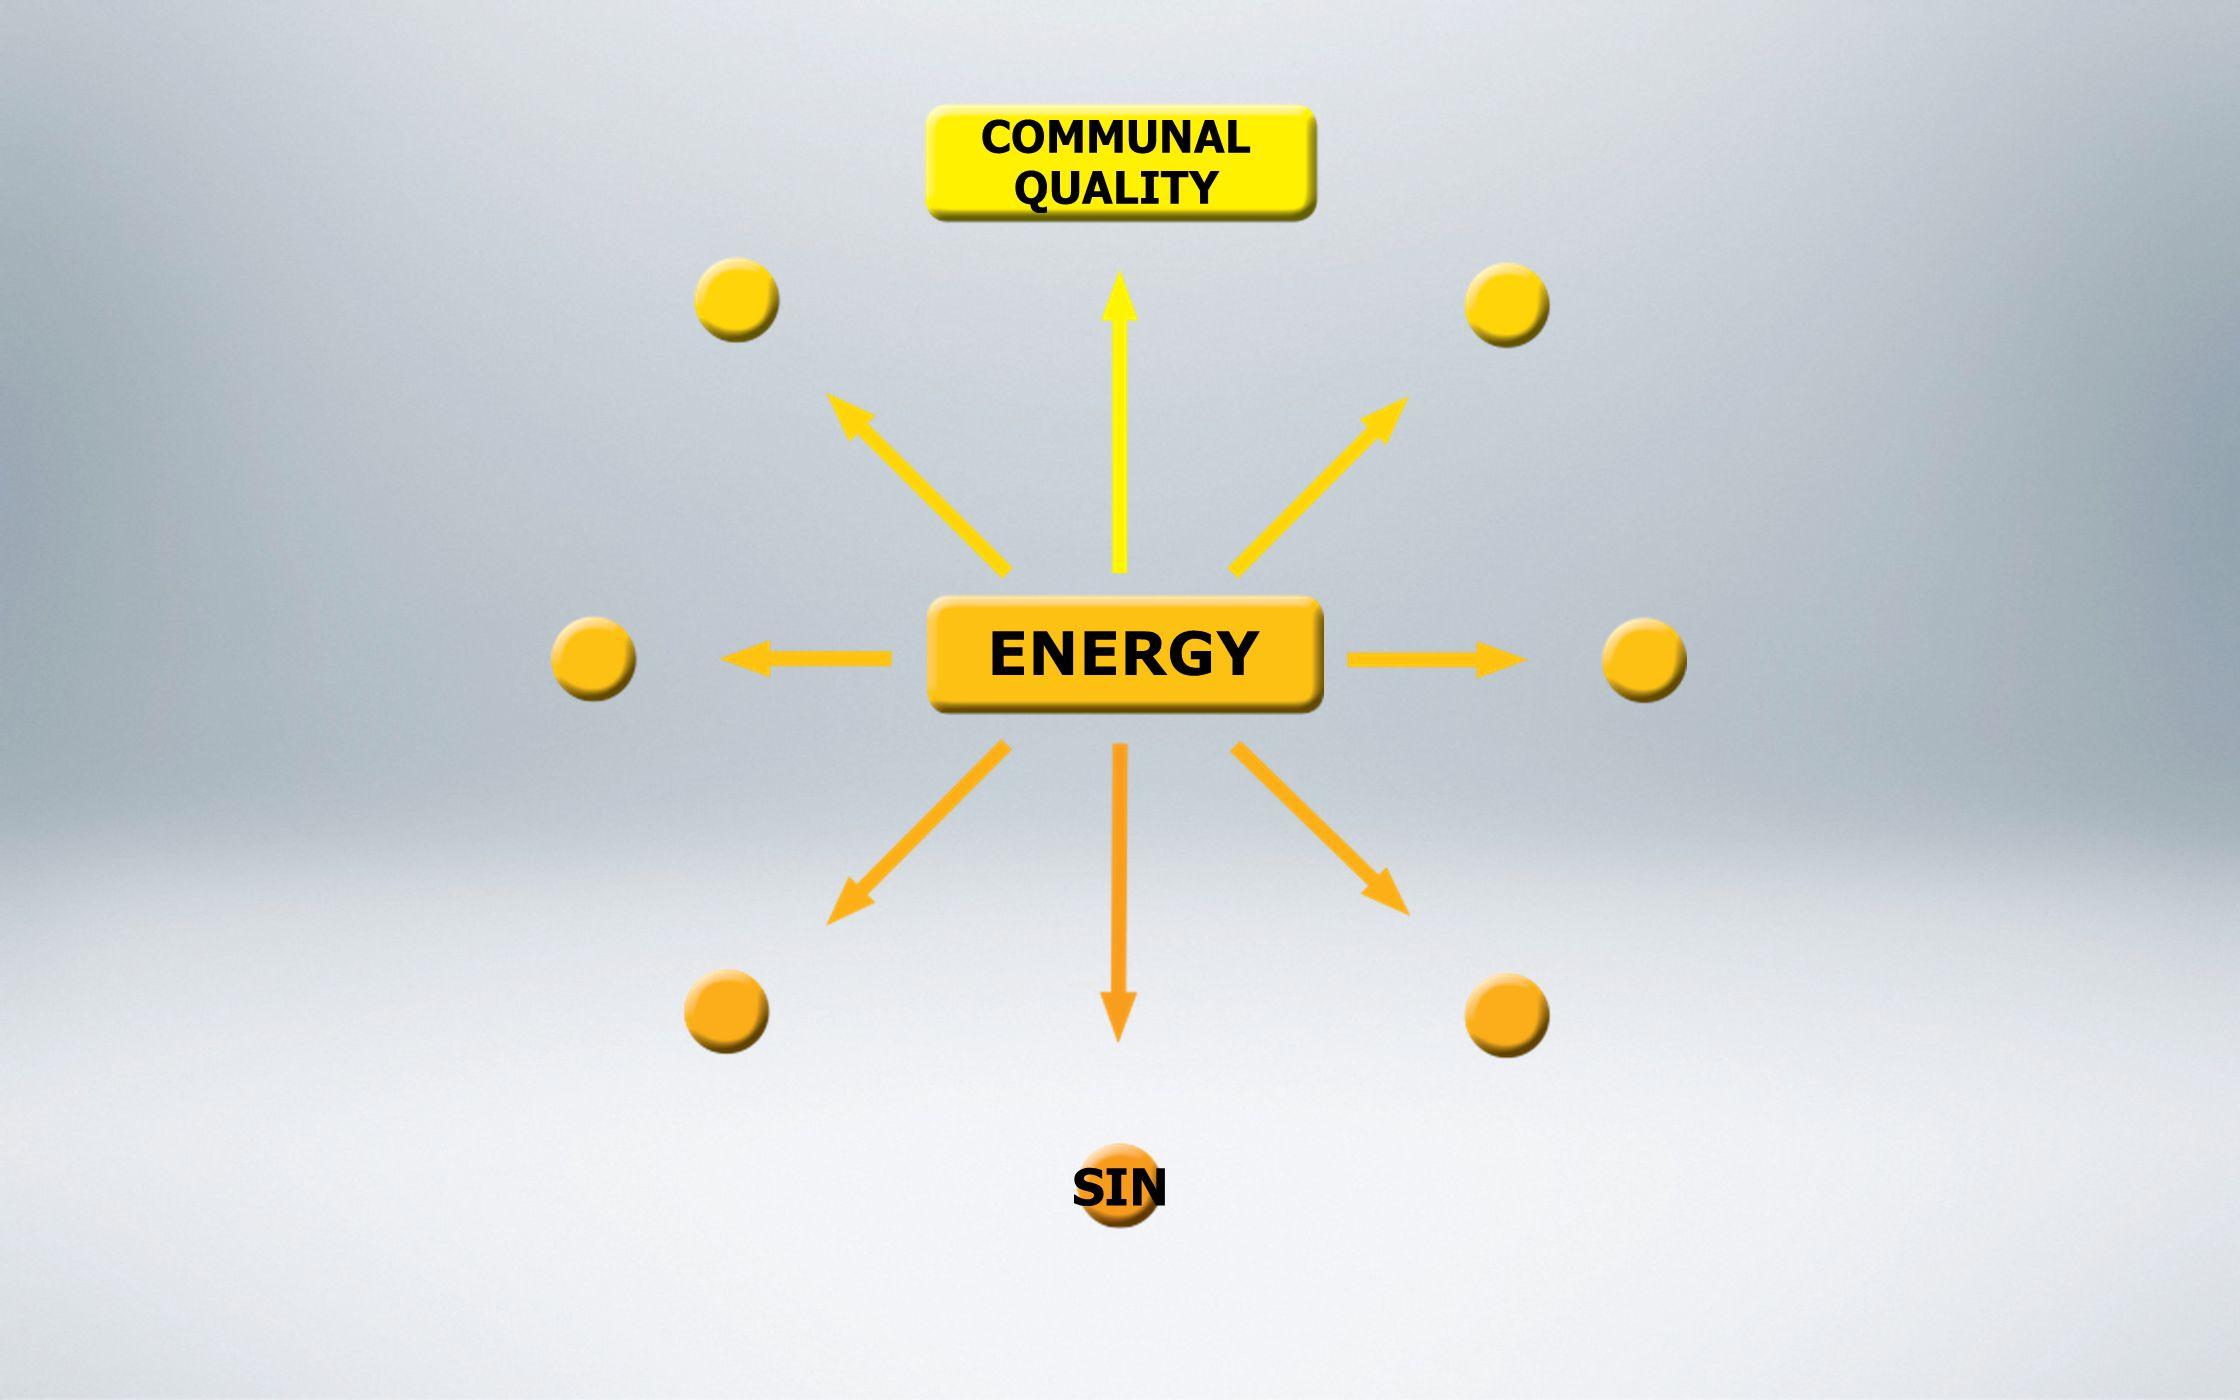 COMMUNAL QUALITY SIN ENERGY